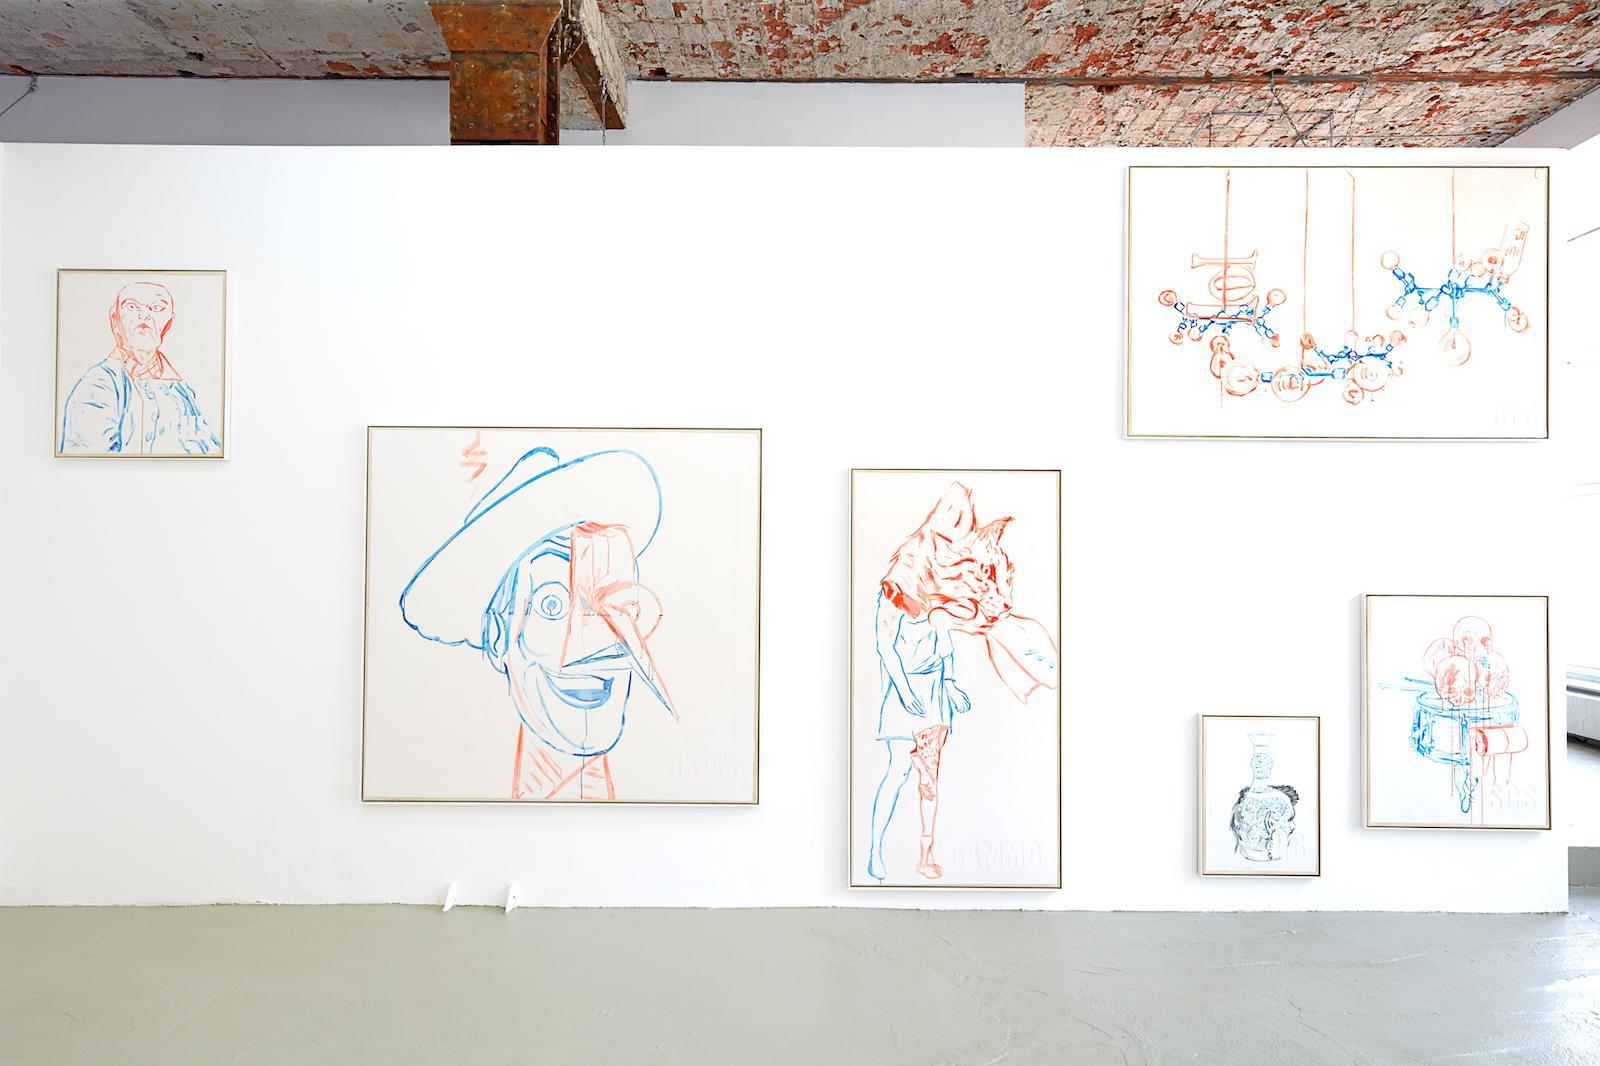 Paolo Chiasera /Frankenstein/ installation view at PSM